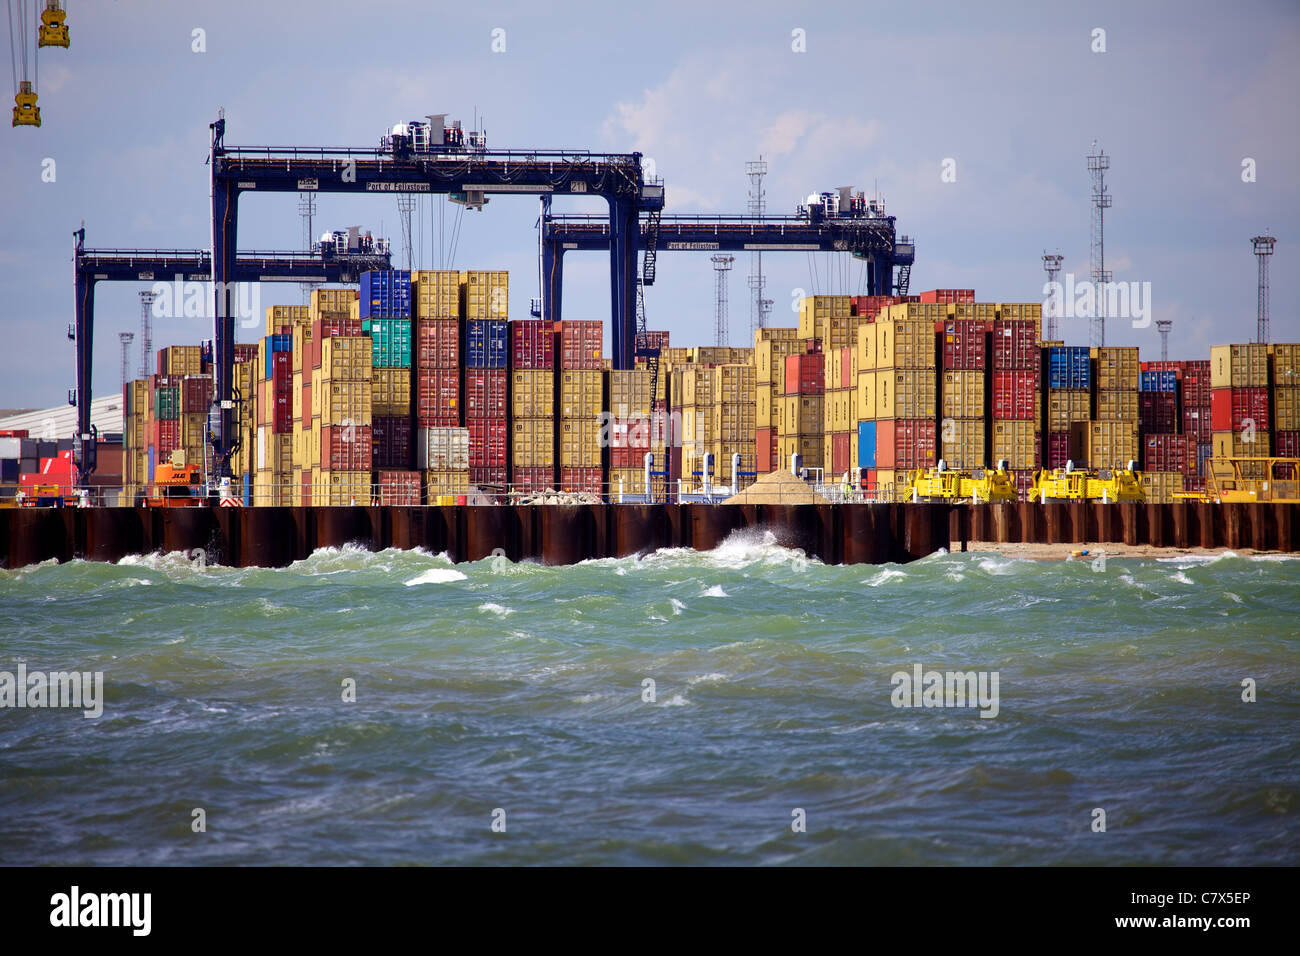 Global Britain International Trade - Port of Felixstowe International Trade - Containers stacked up at Felixstowe Port in the UK Stock Photo